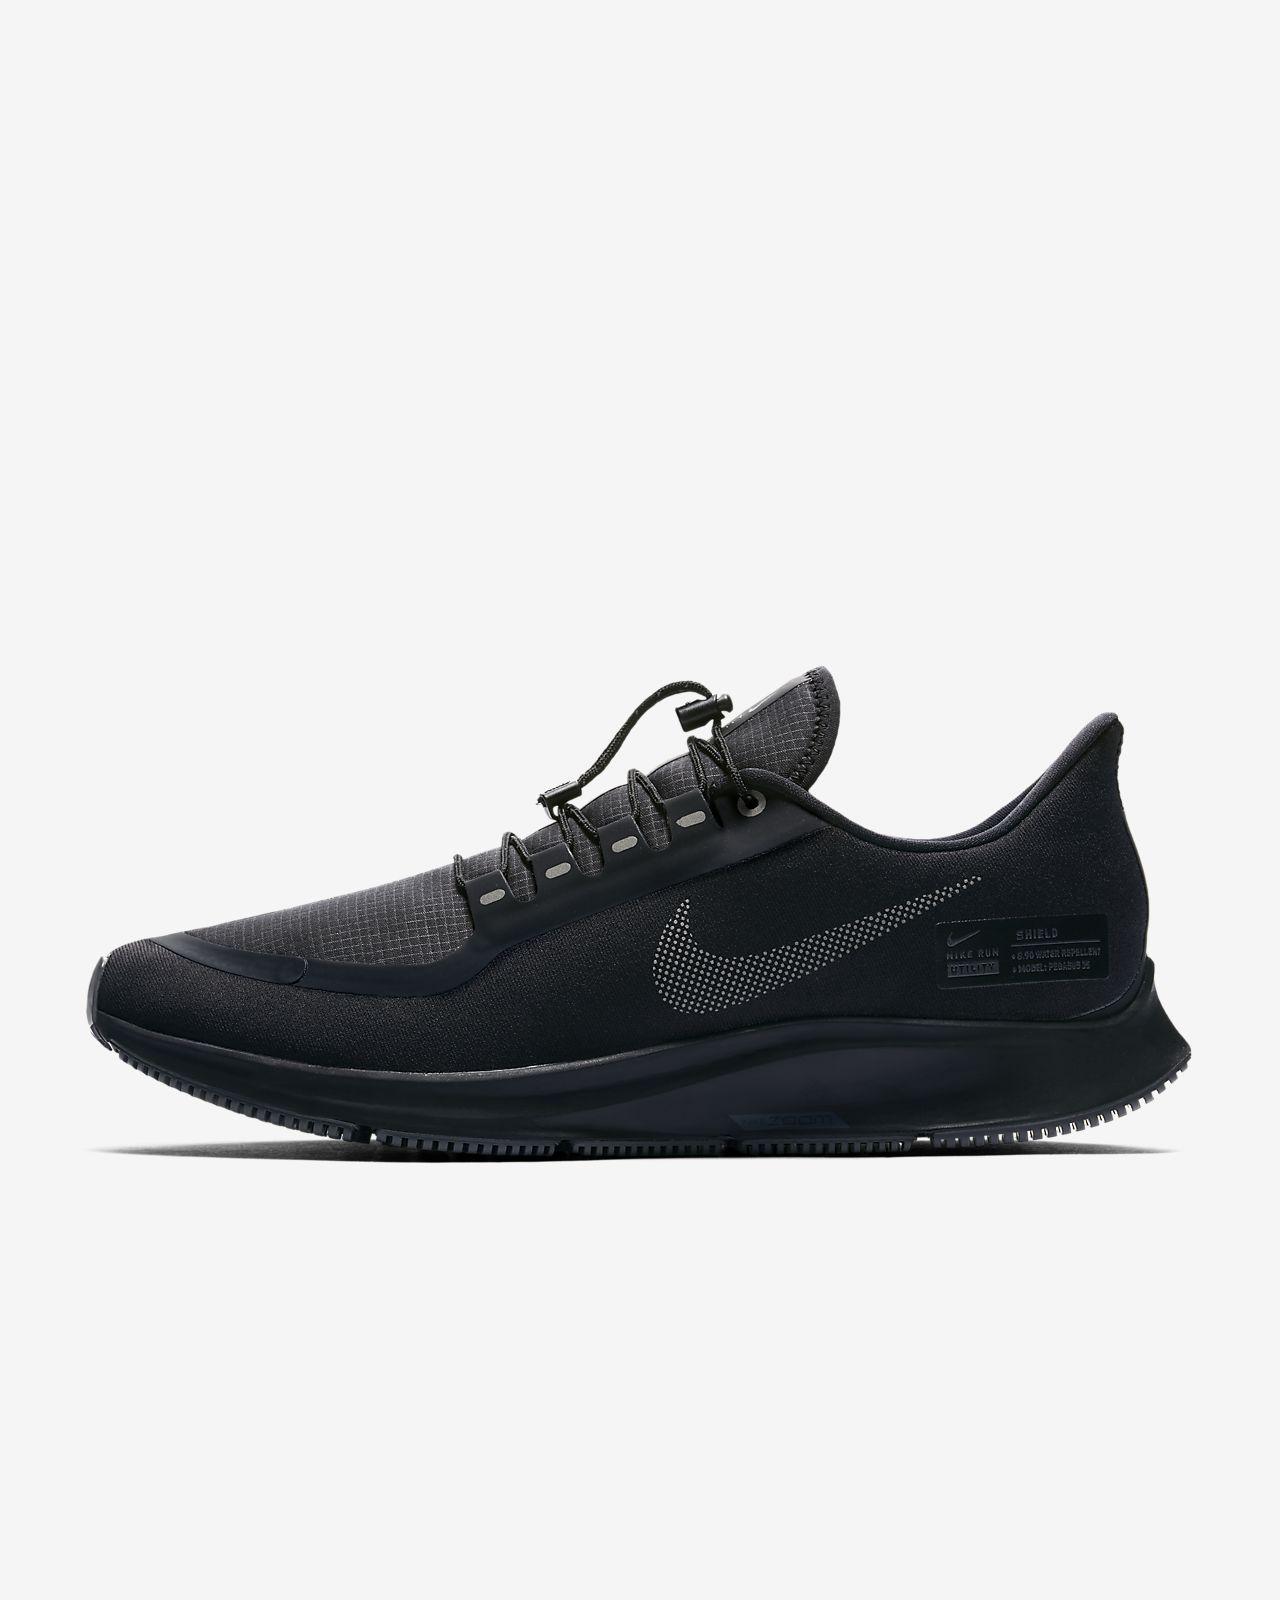 388235b3c ... Calzado de running para hombre Nike Air Zoom Pegasus 35 Shield  Water-Repellent